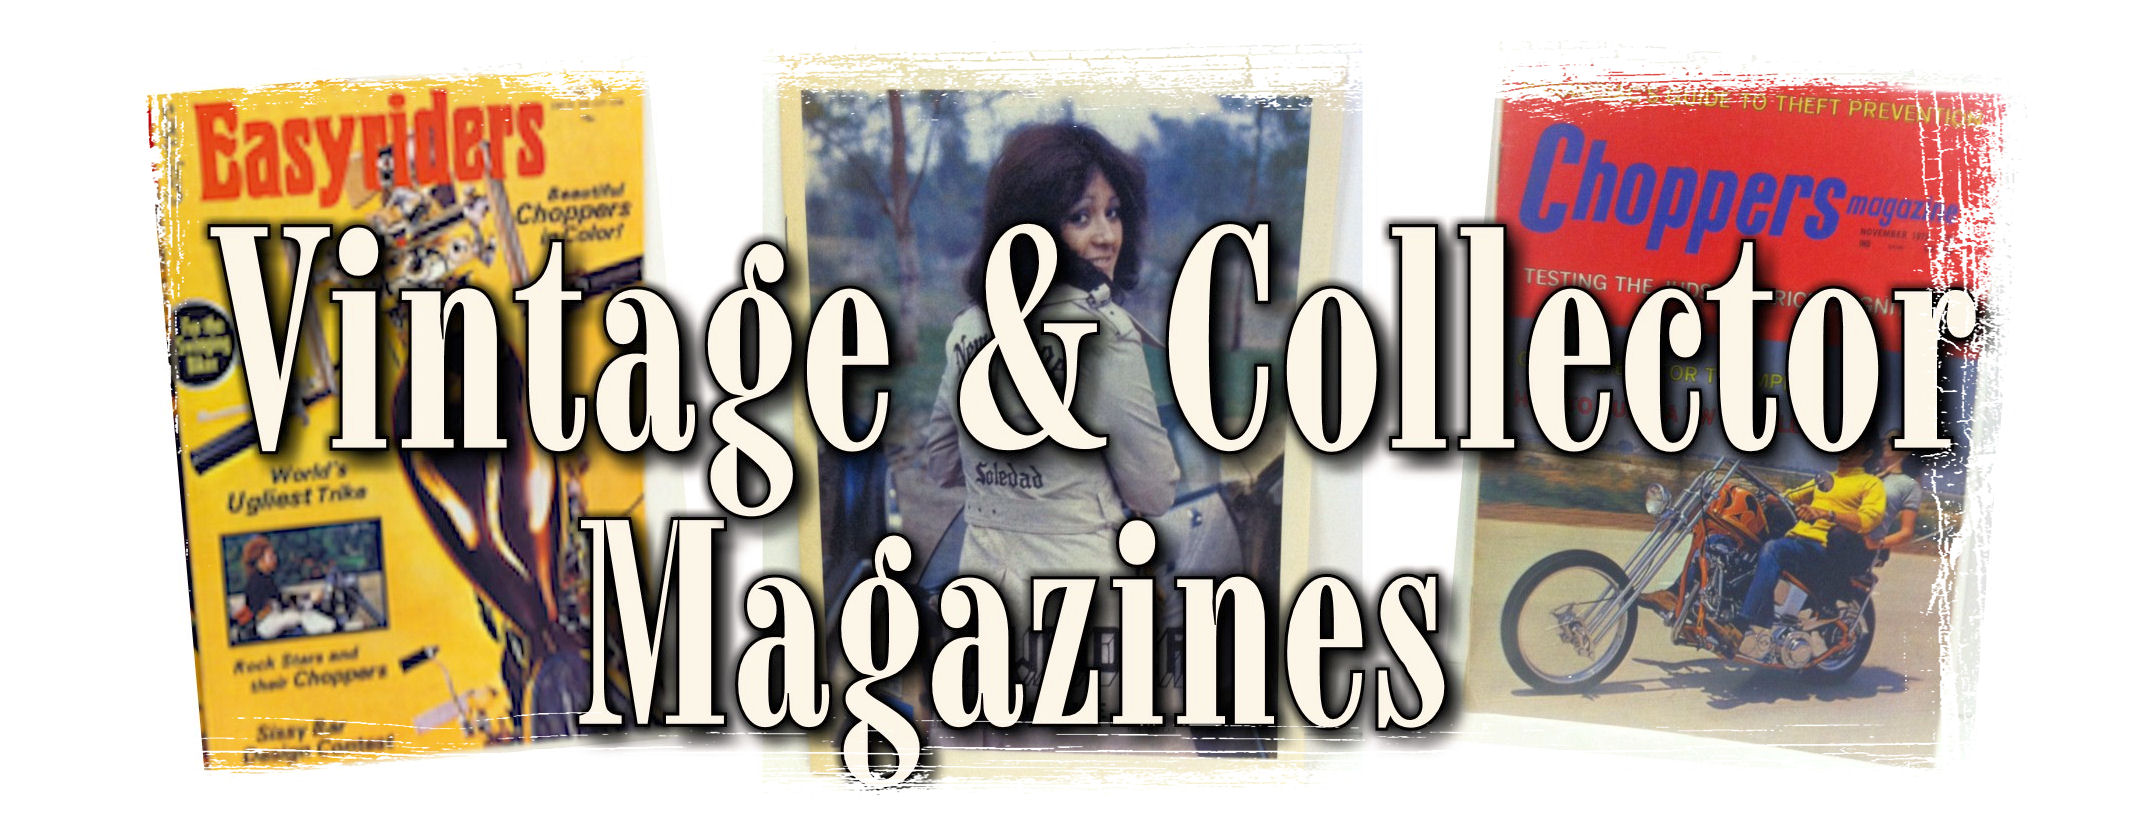 magazine-banner2.jpg